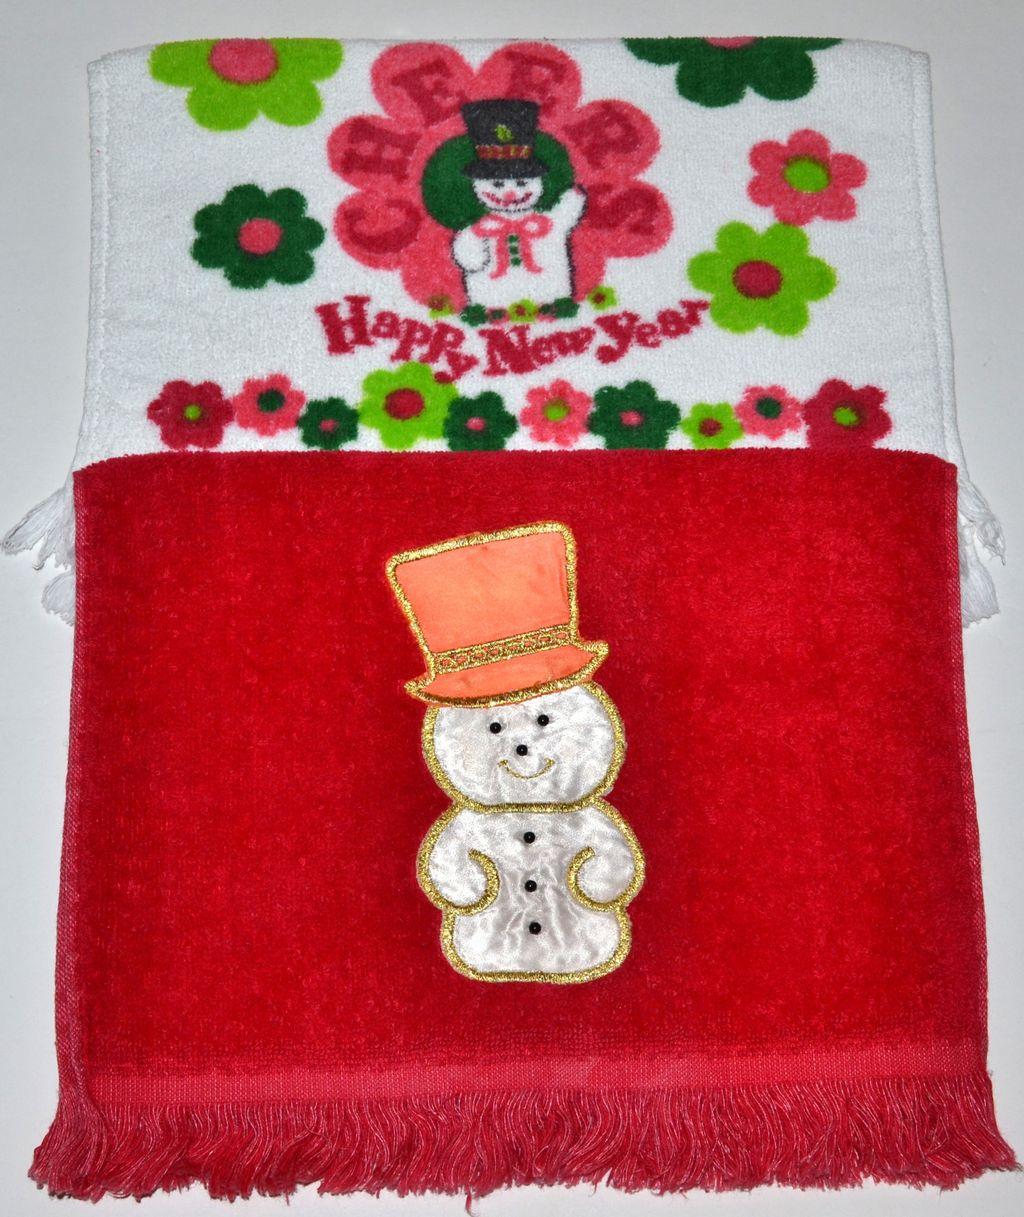 Who Sells Cannon Bath Towels: Set Of 2 Christmas Kitchen/Bath Fringe Towels : Kitsch